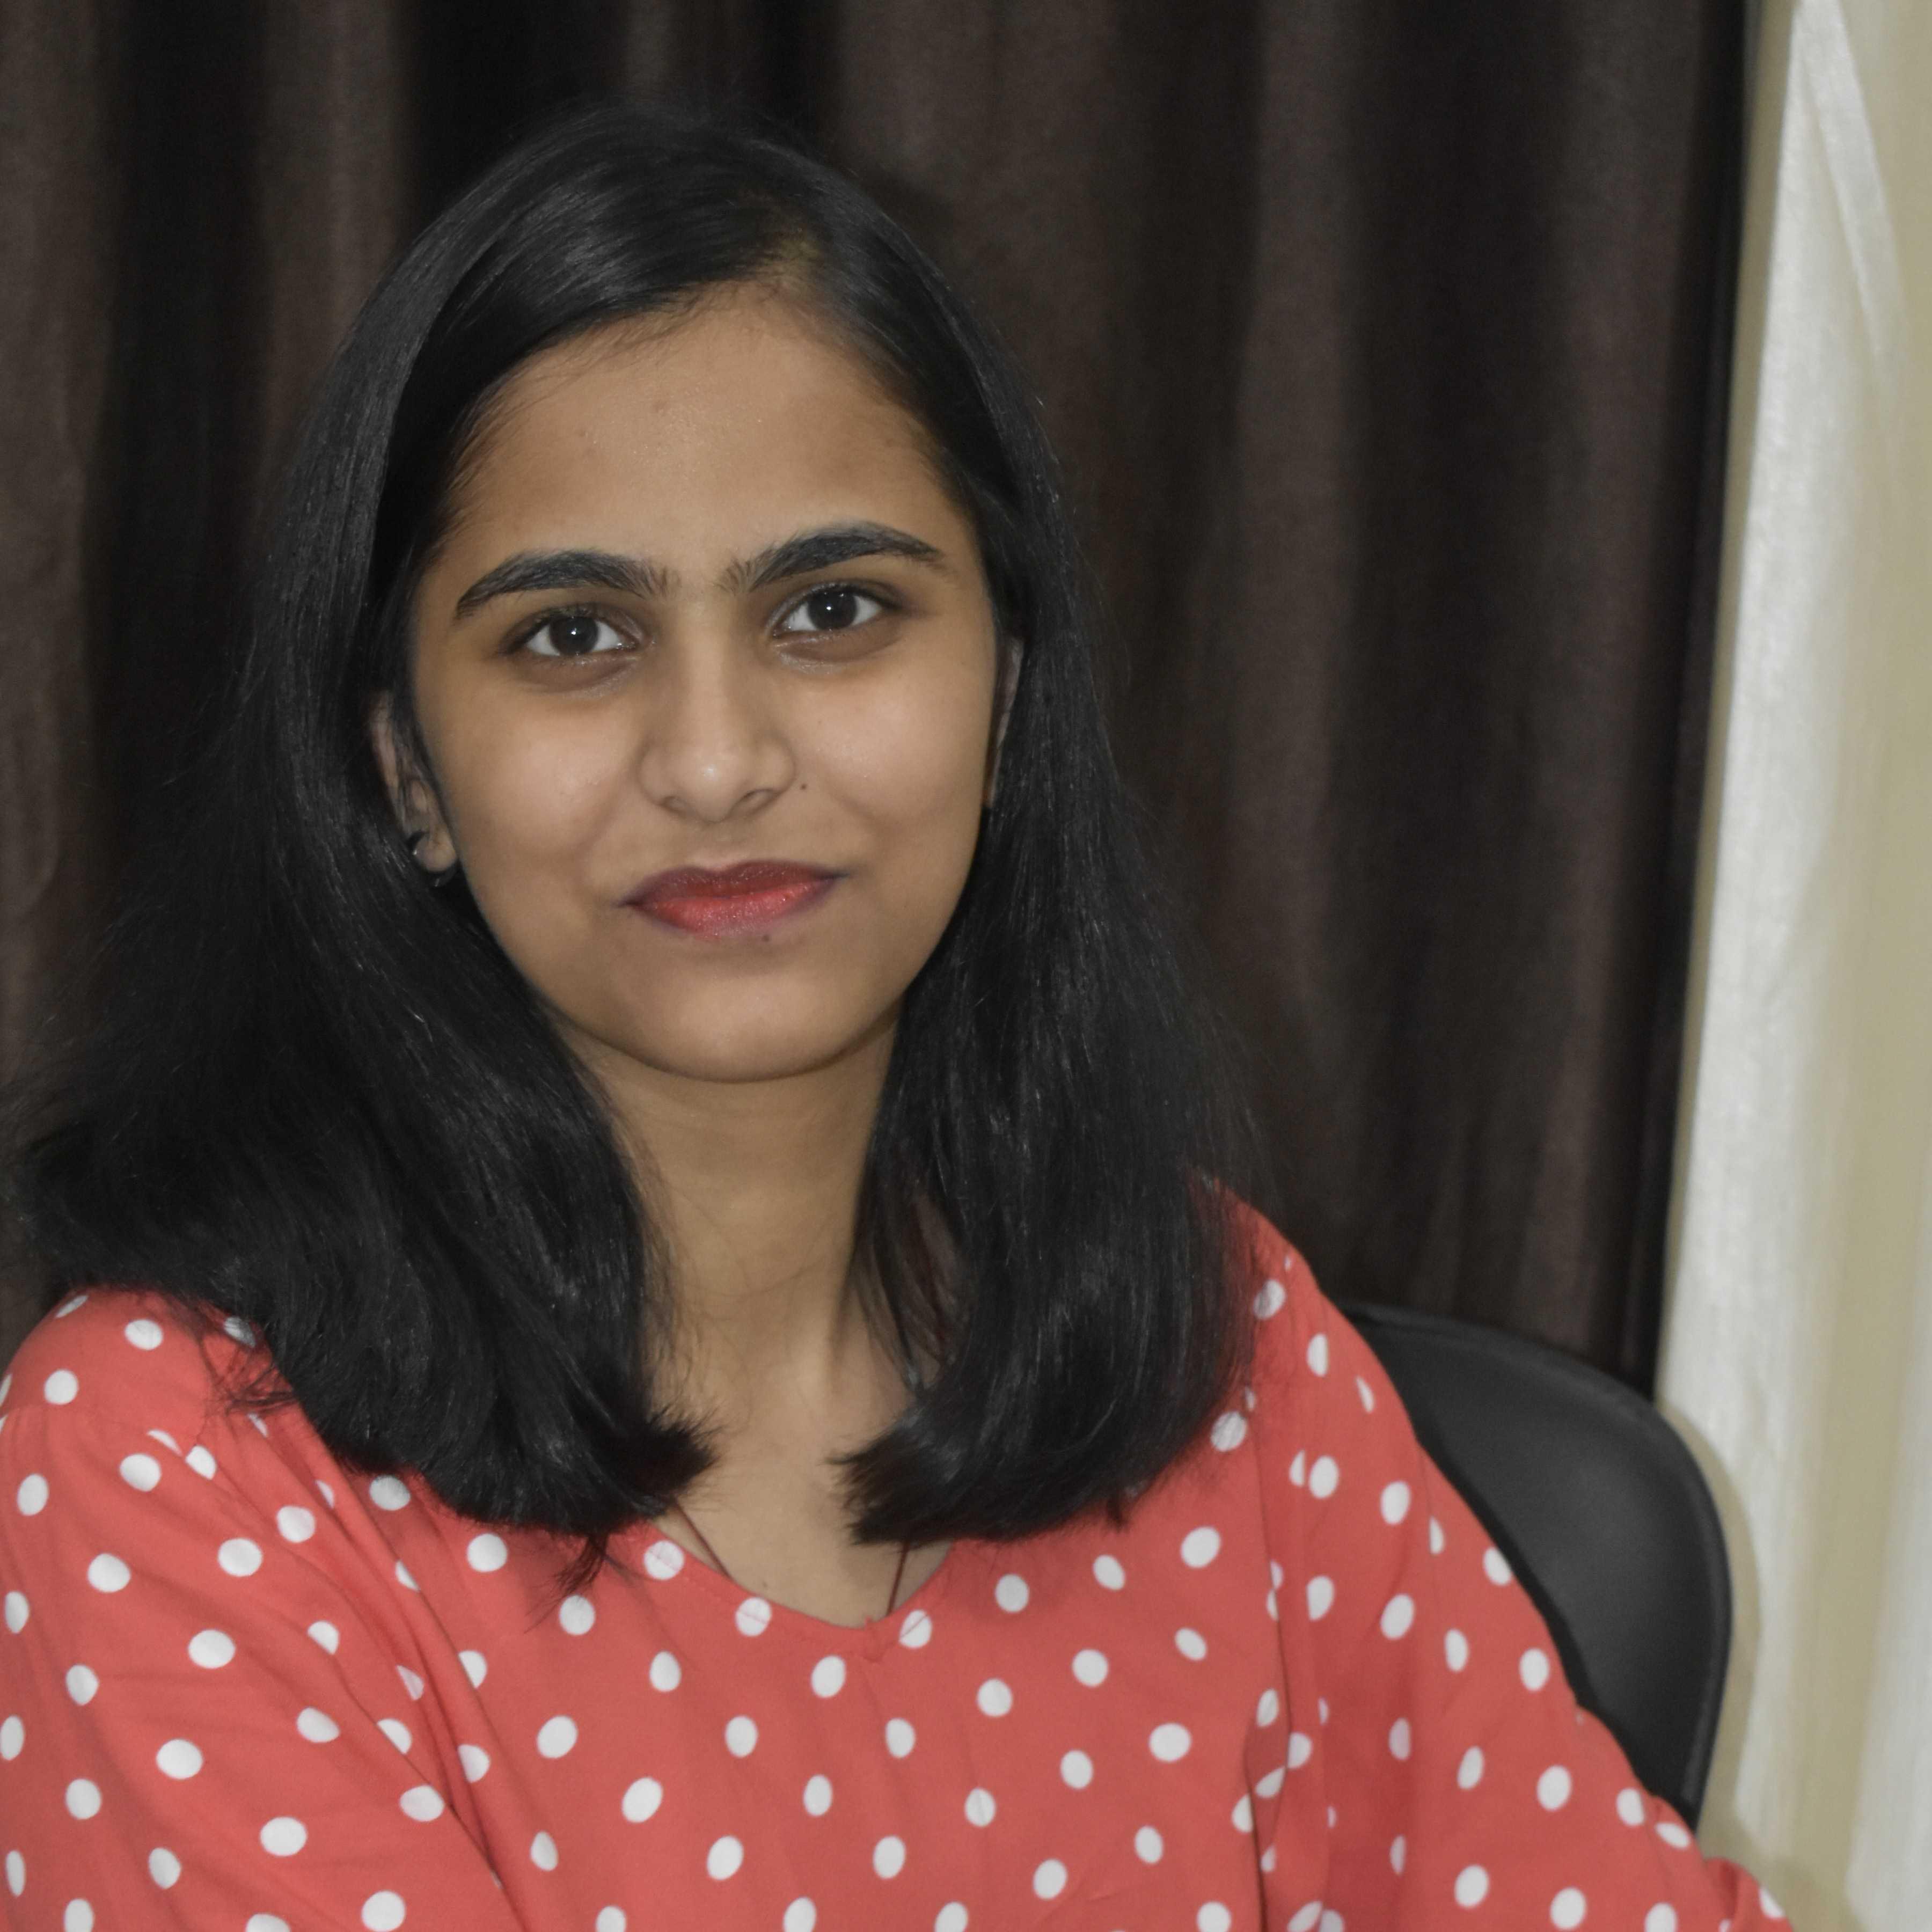 Deepti Srivastava